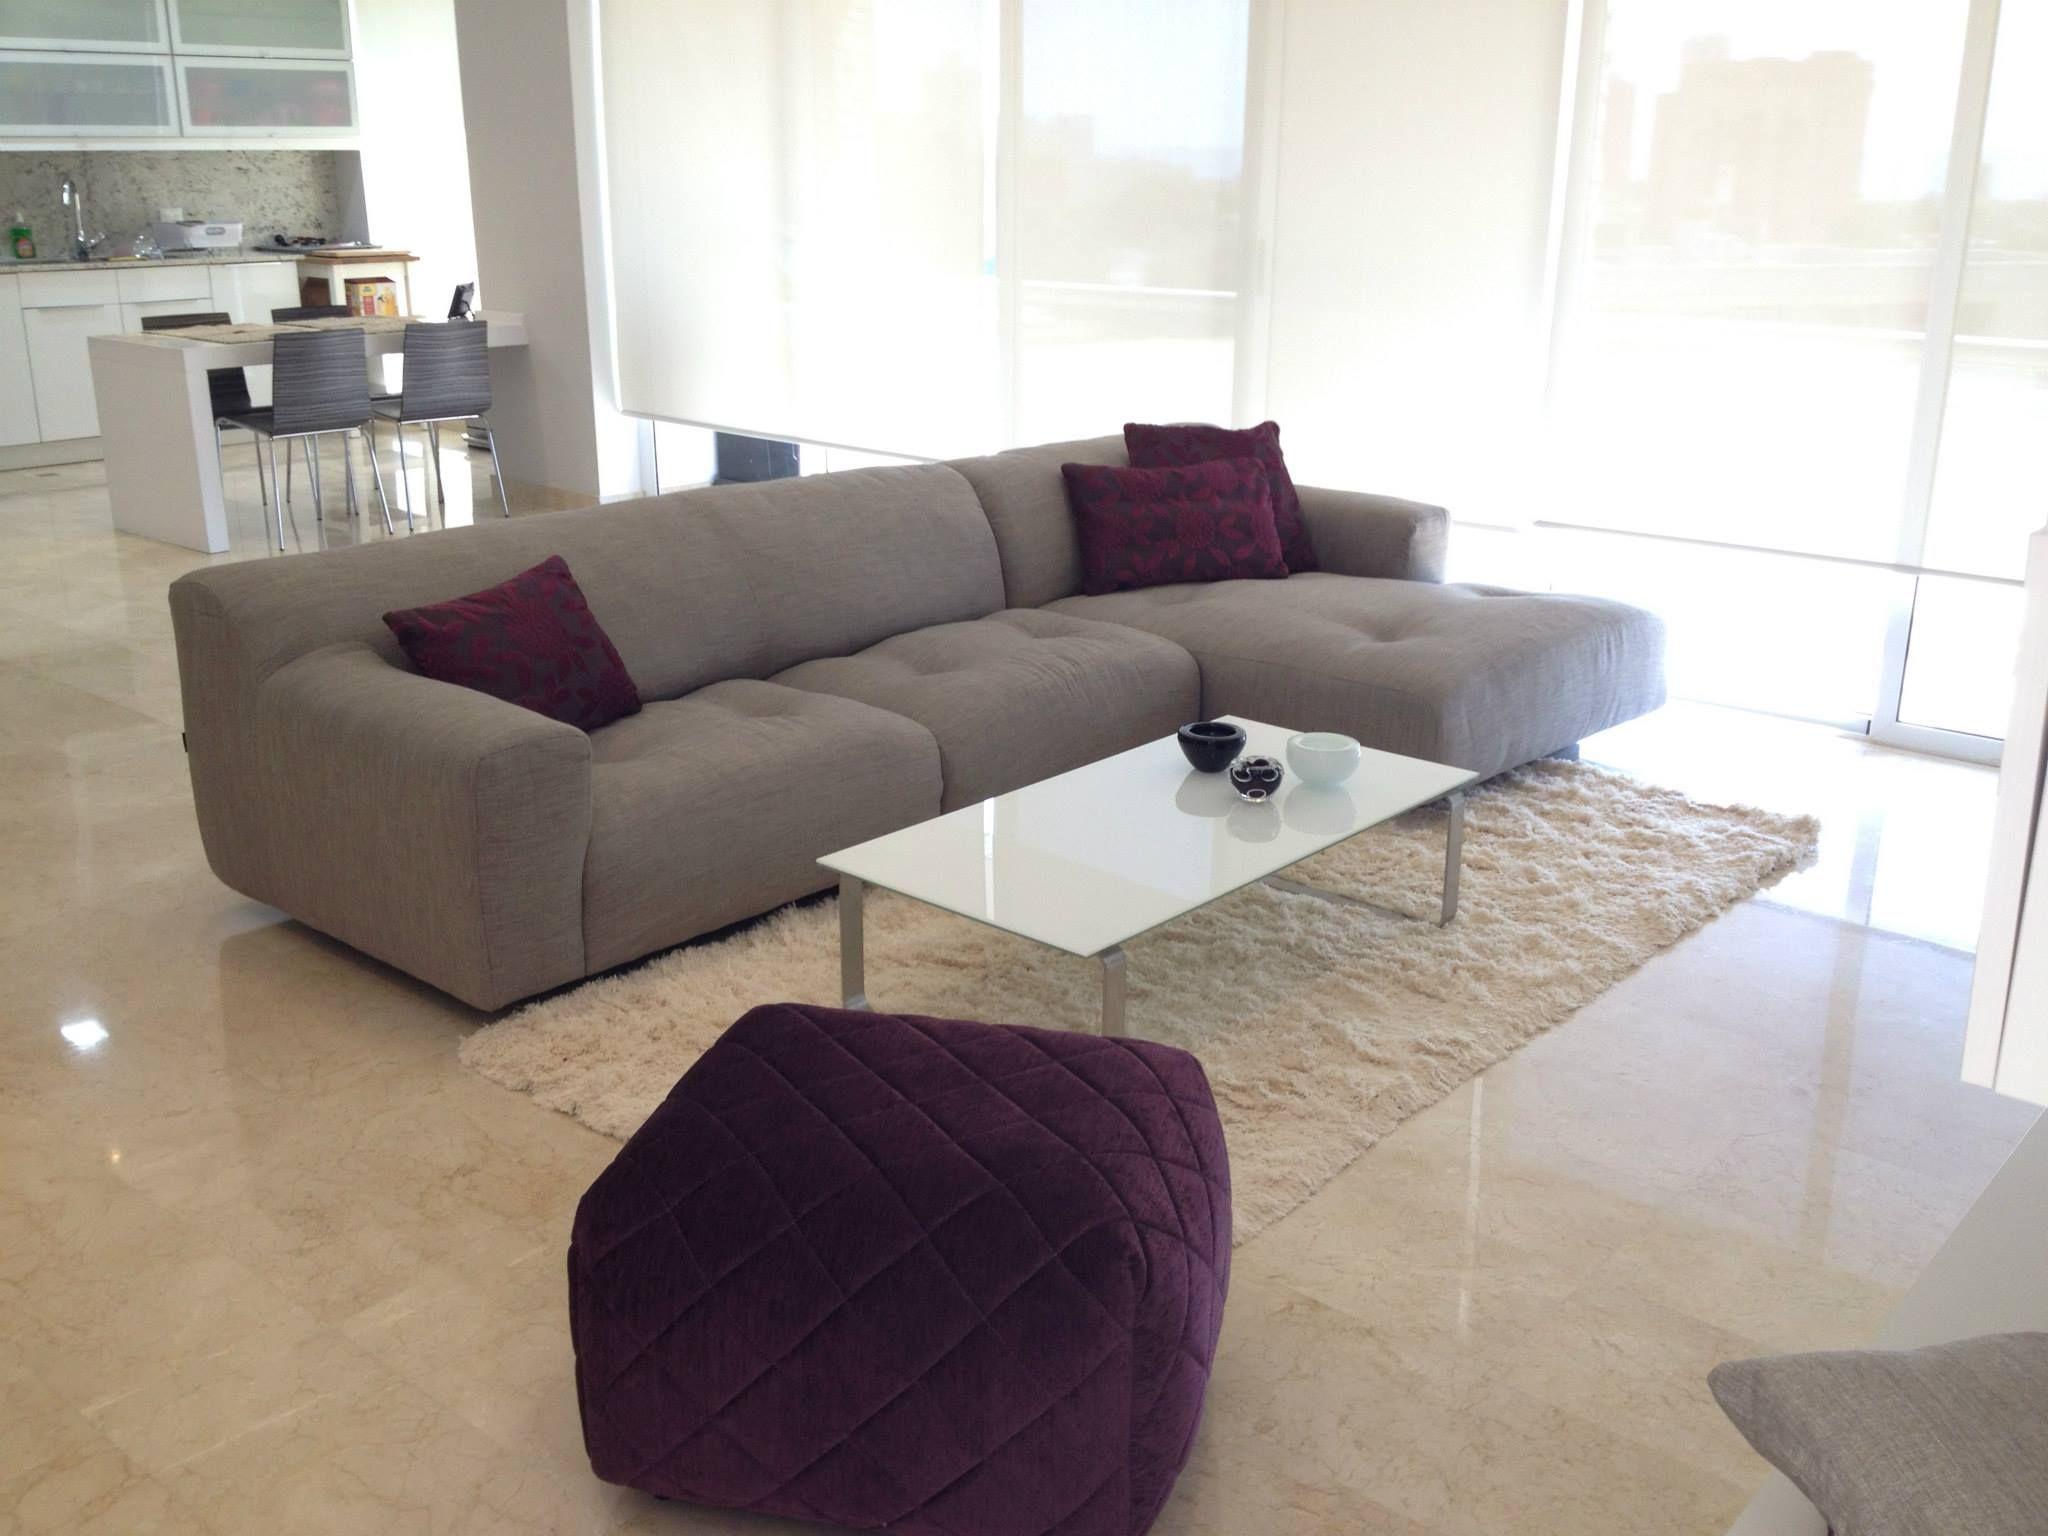 Zientte Muebles Contempor Neos Salas Living Room Pinterest  # Muebles Zientte